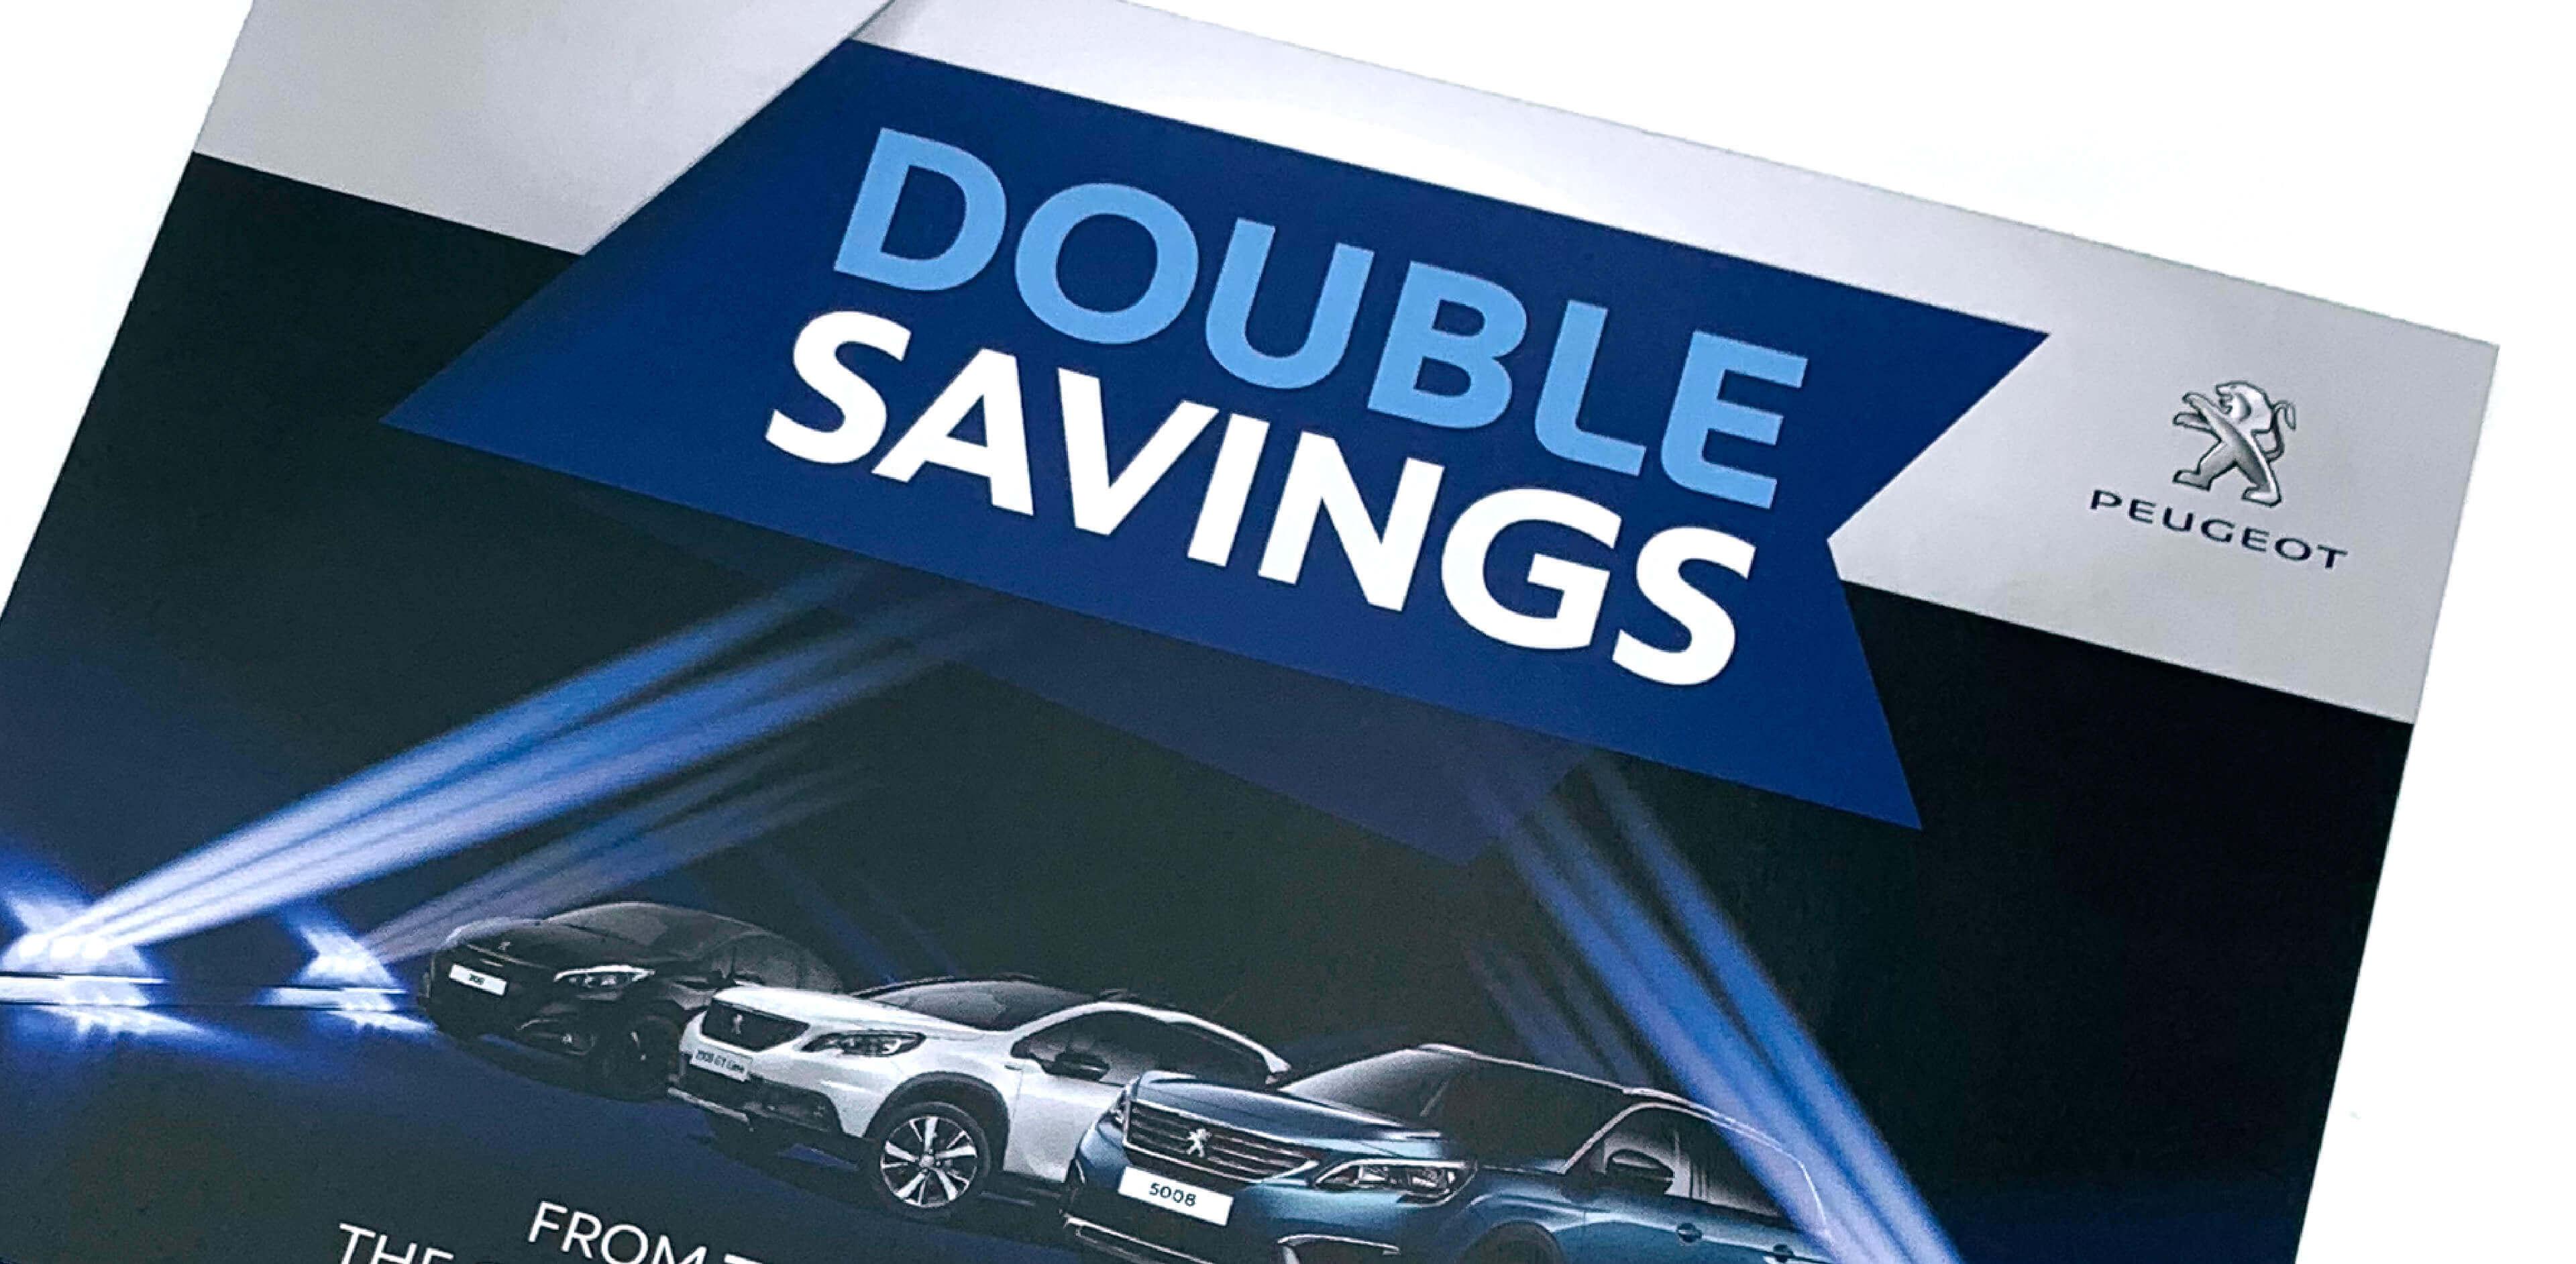 Trenton Double Savings Artwork